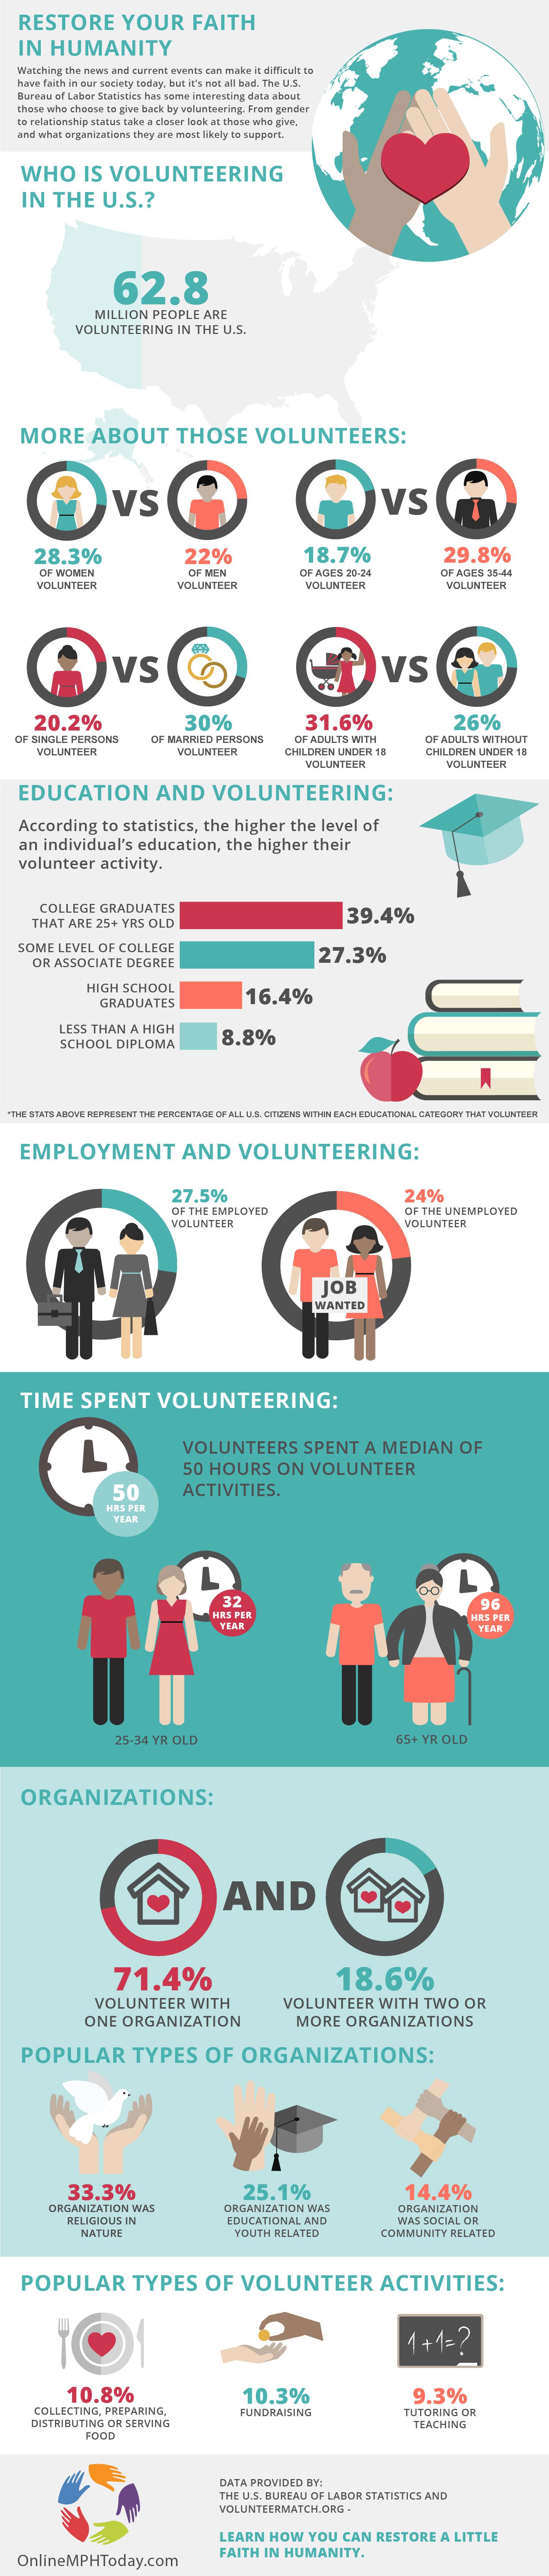 restore-faith-humanity-volunteer-statistics-OnlineMPH